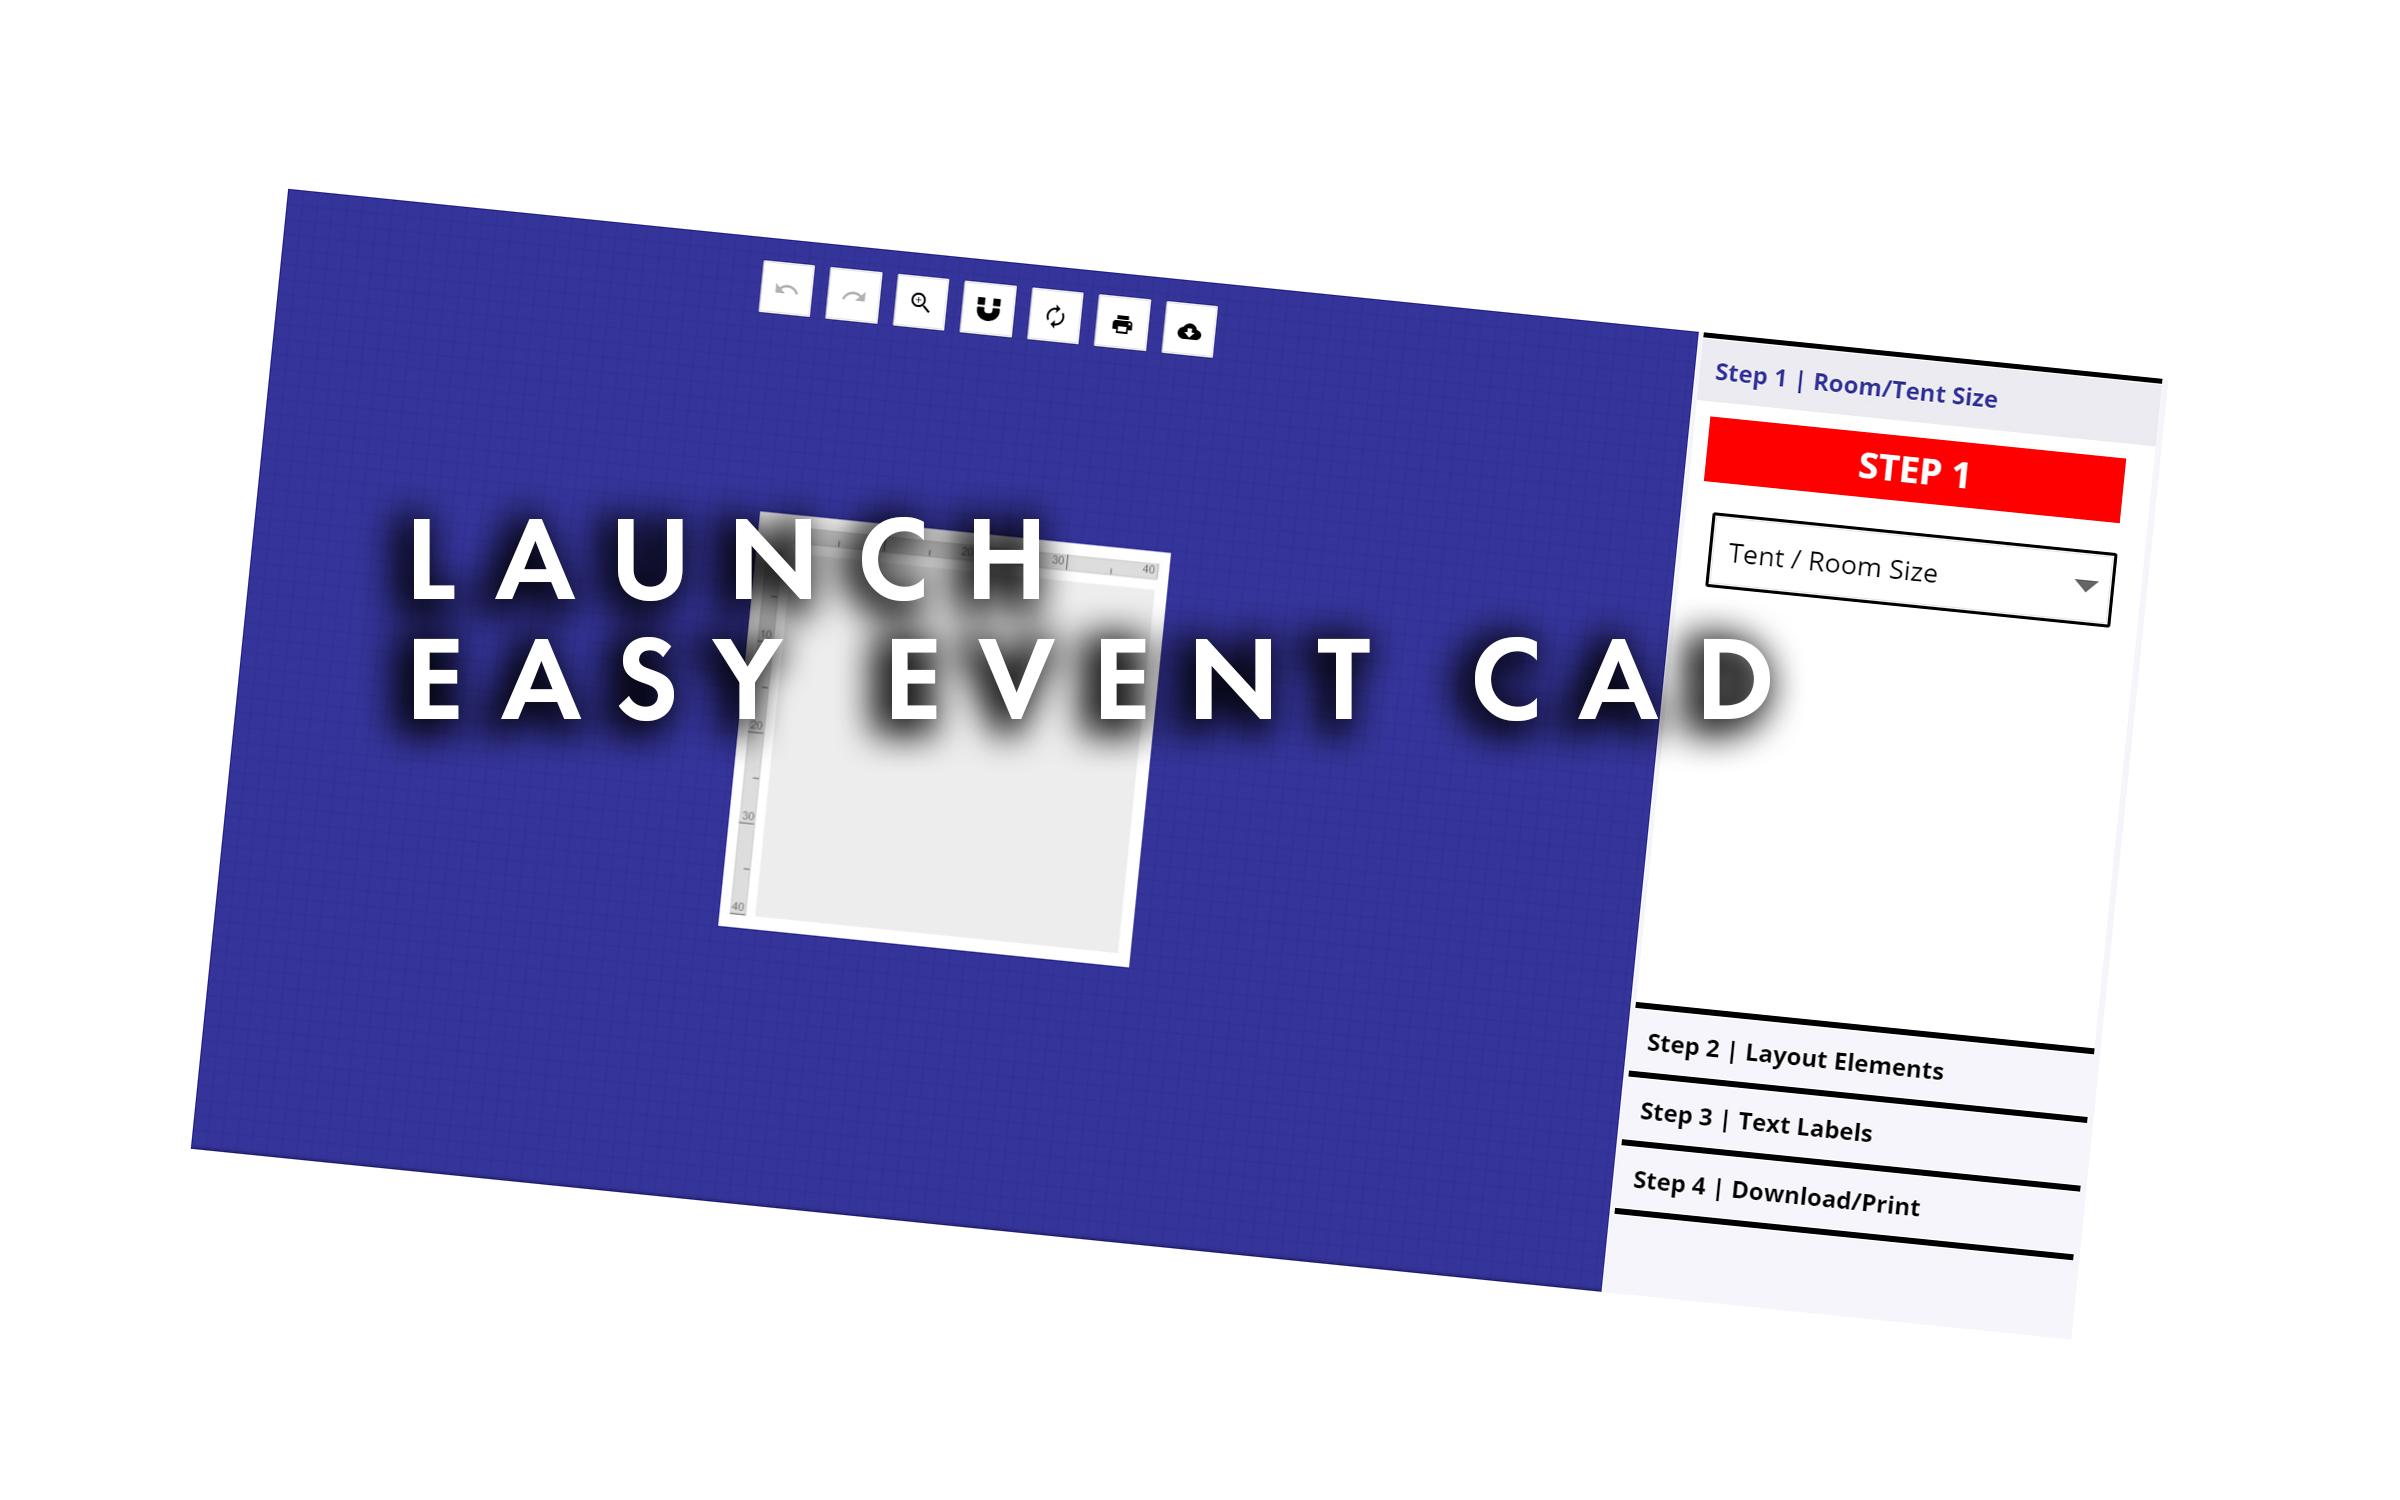 EZ Event Cad